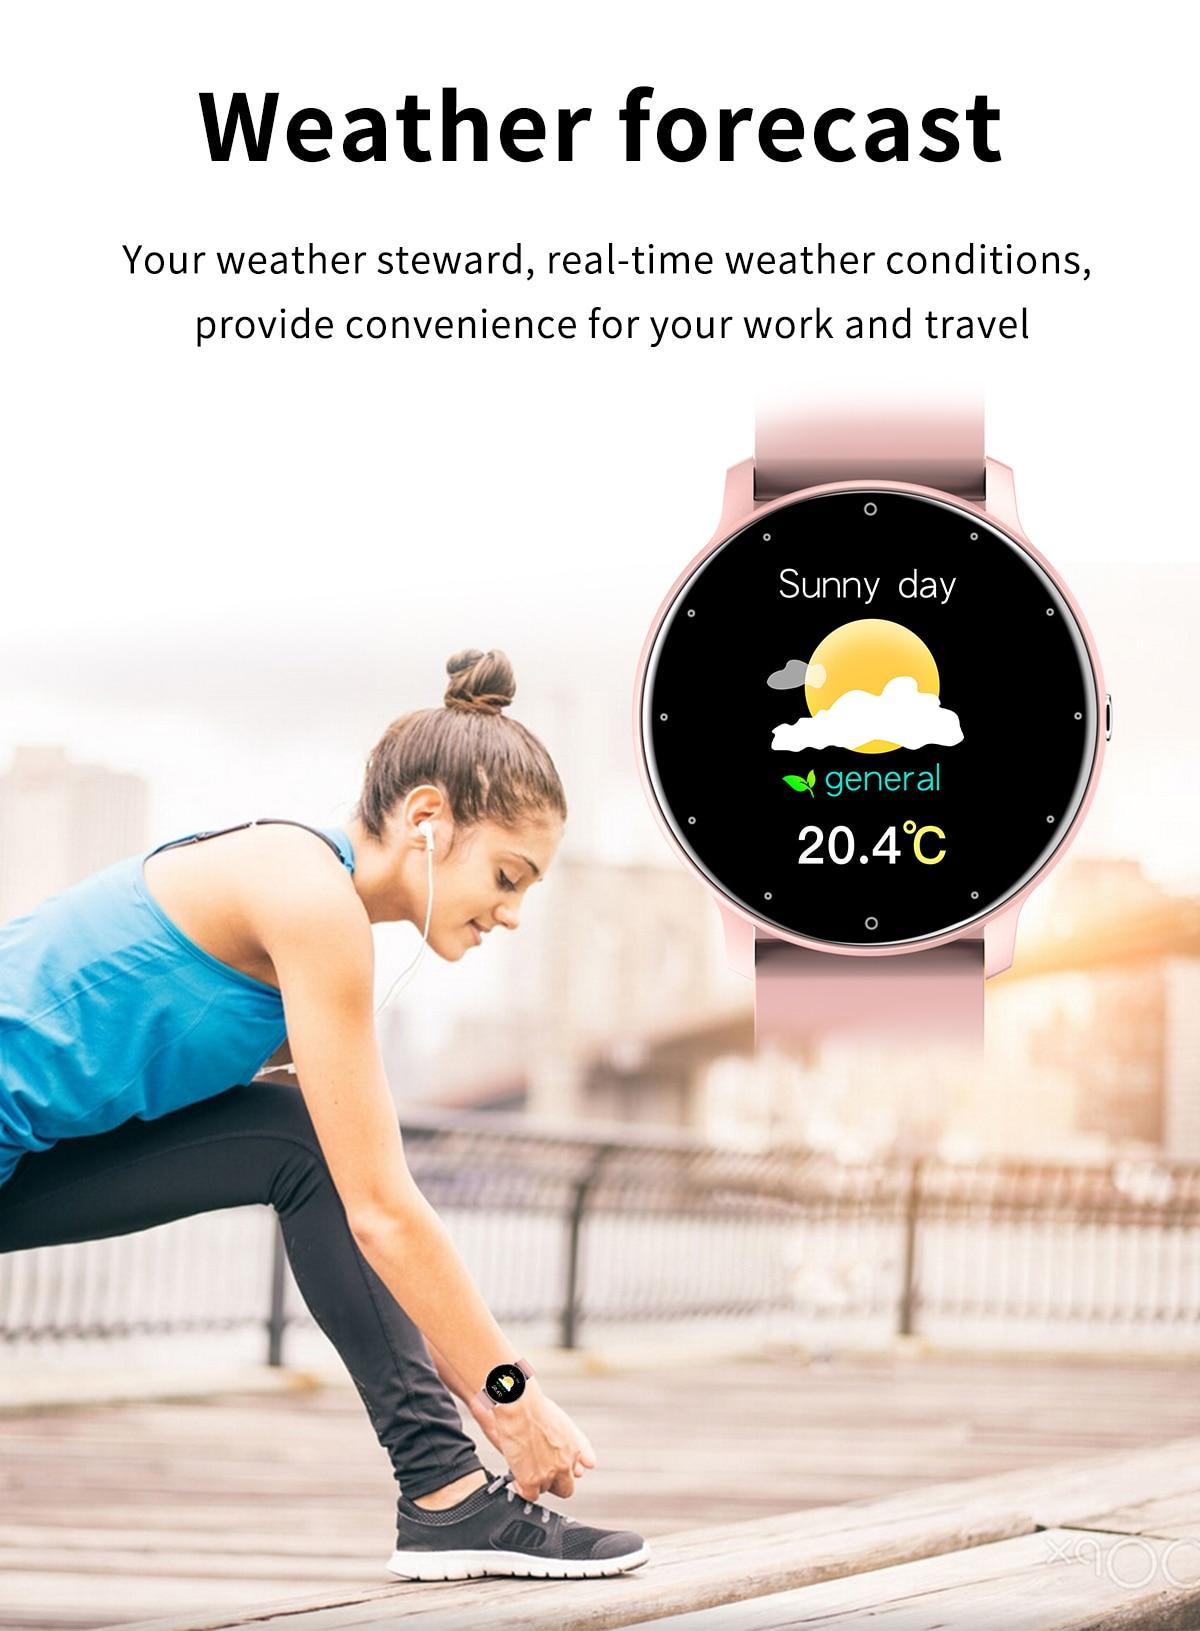 He90ca65102254f18a1490fc0a238bcafY LIGE 2021 Fashion Smart Watch Men Fitness Bracelet Heart Rate Blood Pressure Monitoring Sports Tracker Smartwatch Gift for Women